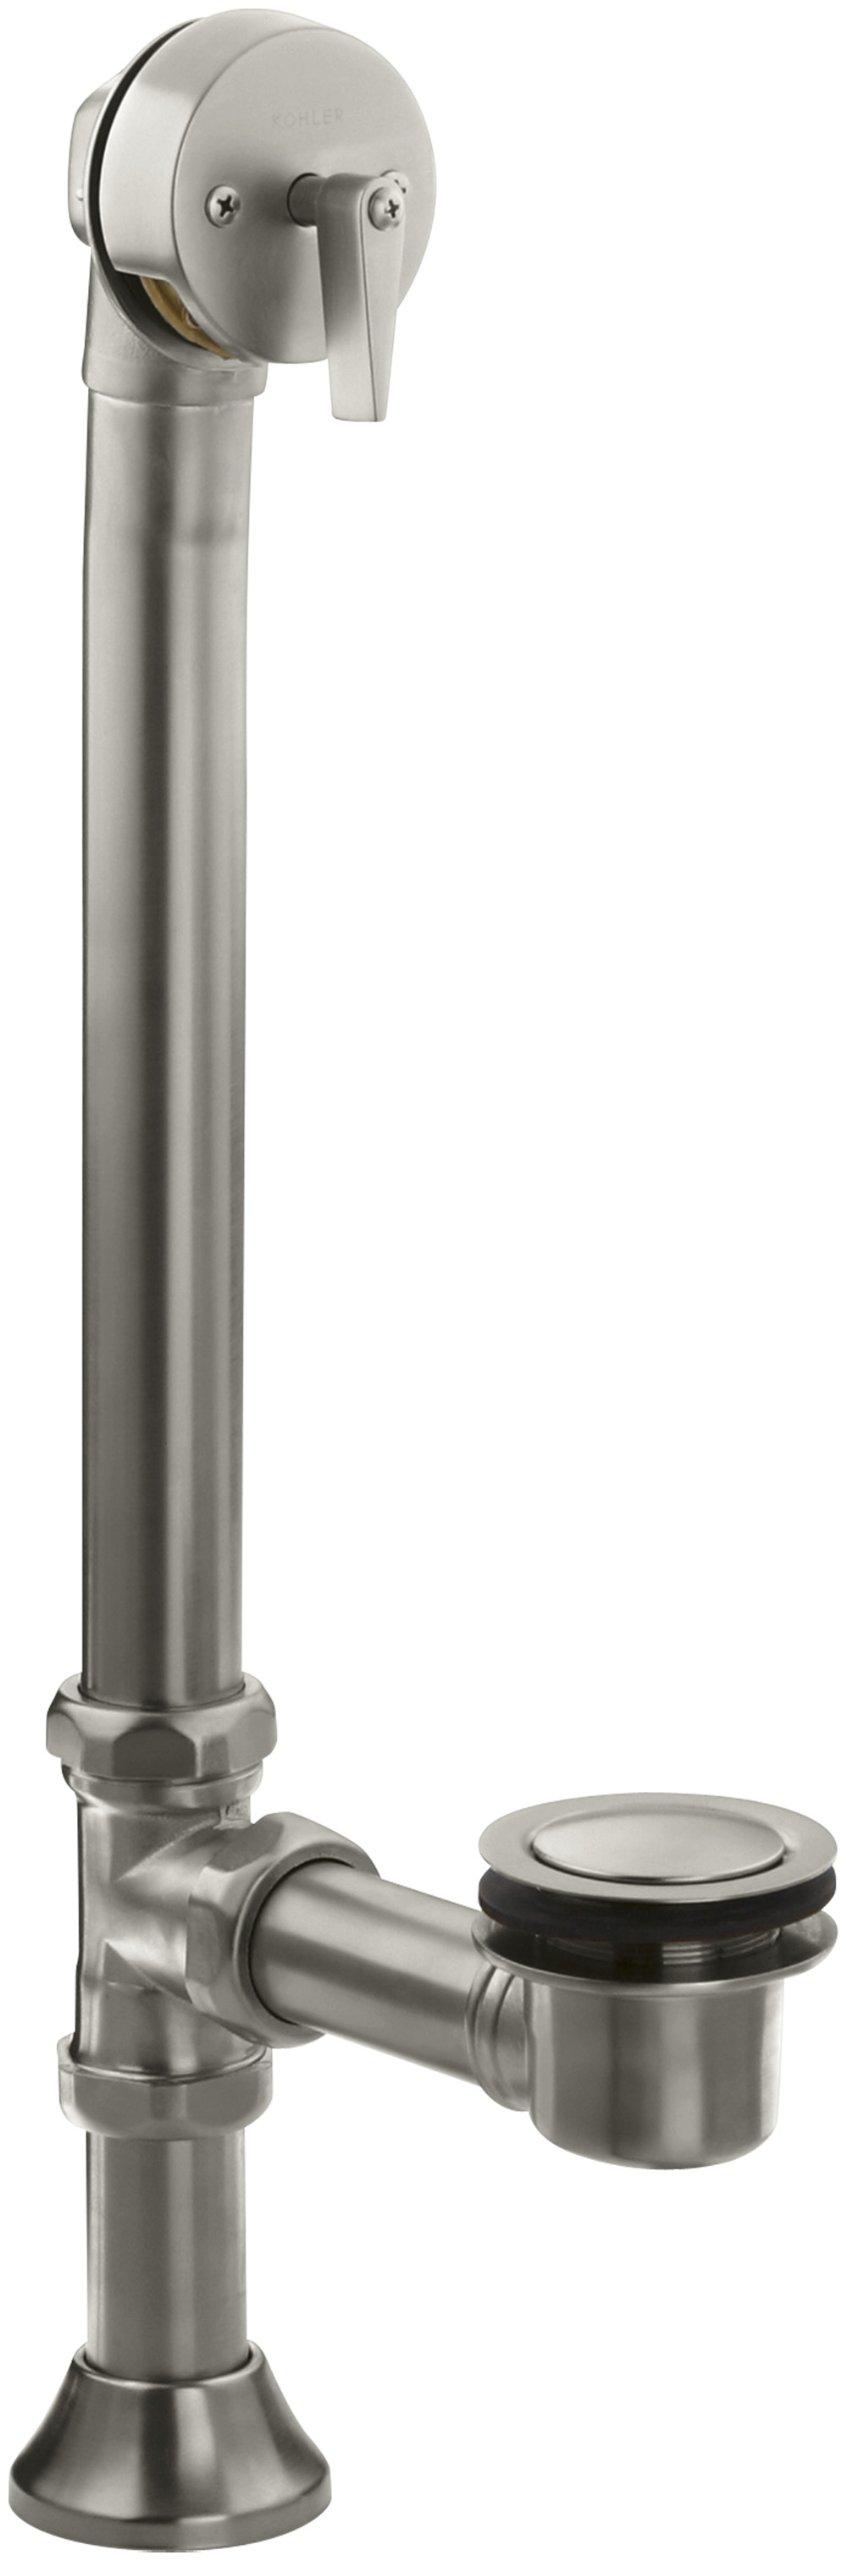 KOHLER K-7178-BN Clearflo Decorative 1-1/2-Inch Adjustable Pop-Up Bath Drain, Vibrant Brushed Nickel